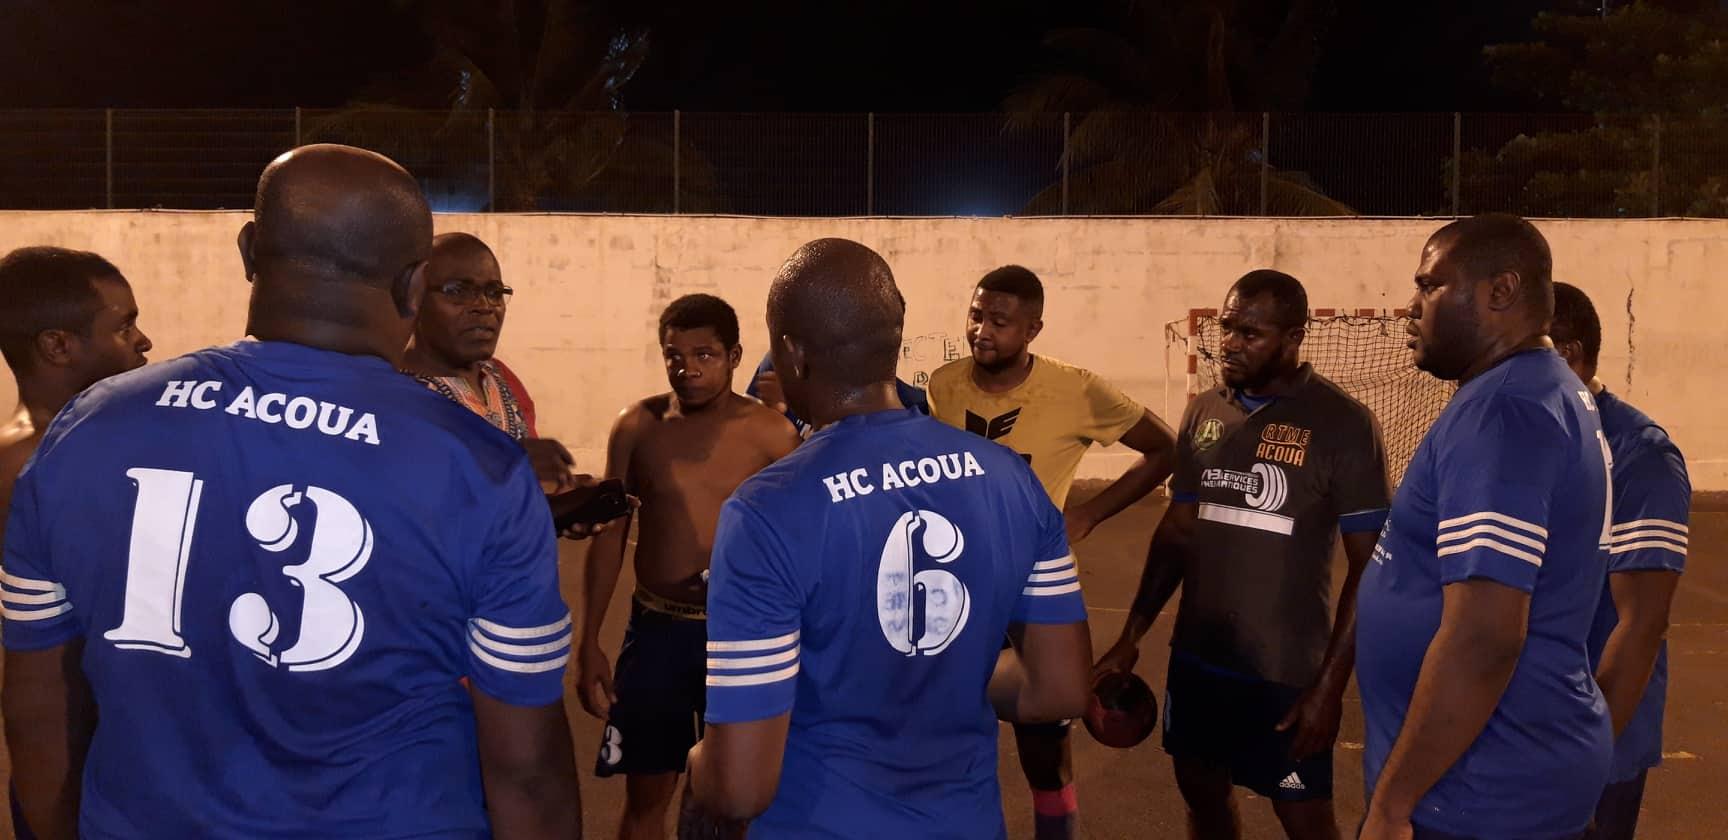 HC Acoua vs Chirongui, Oct 2019